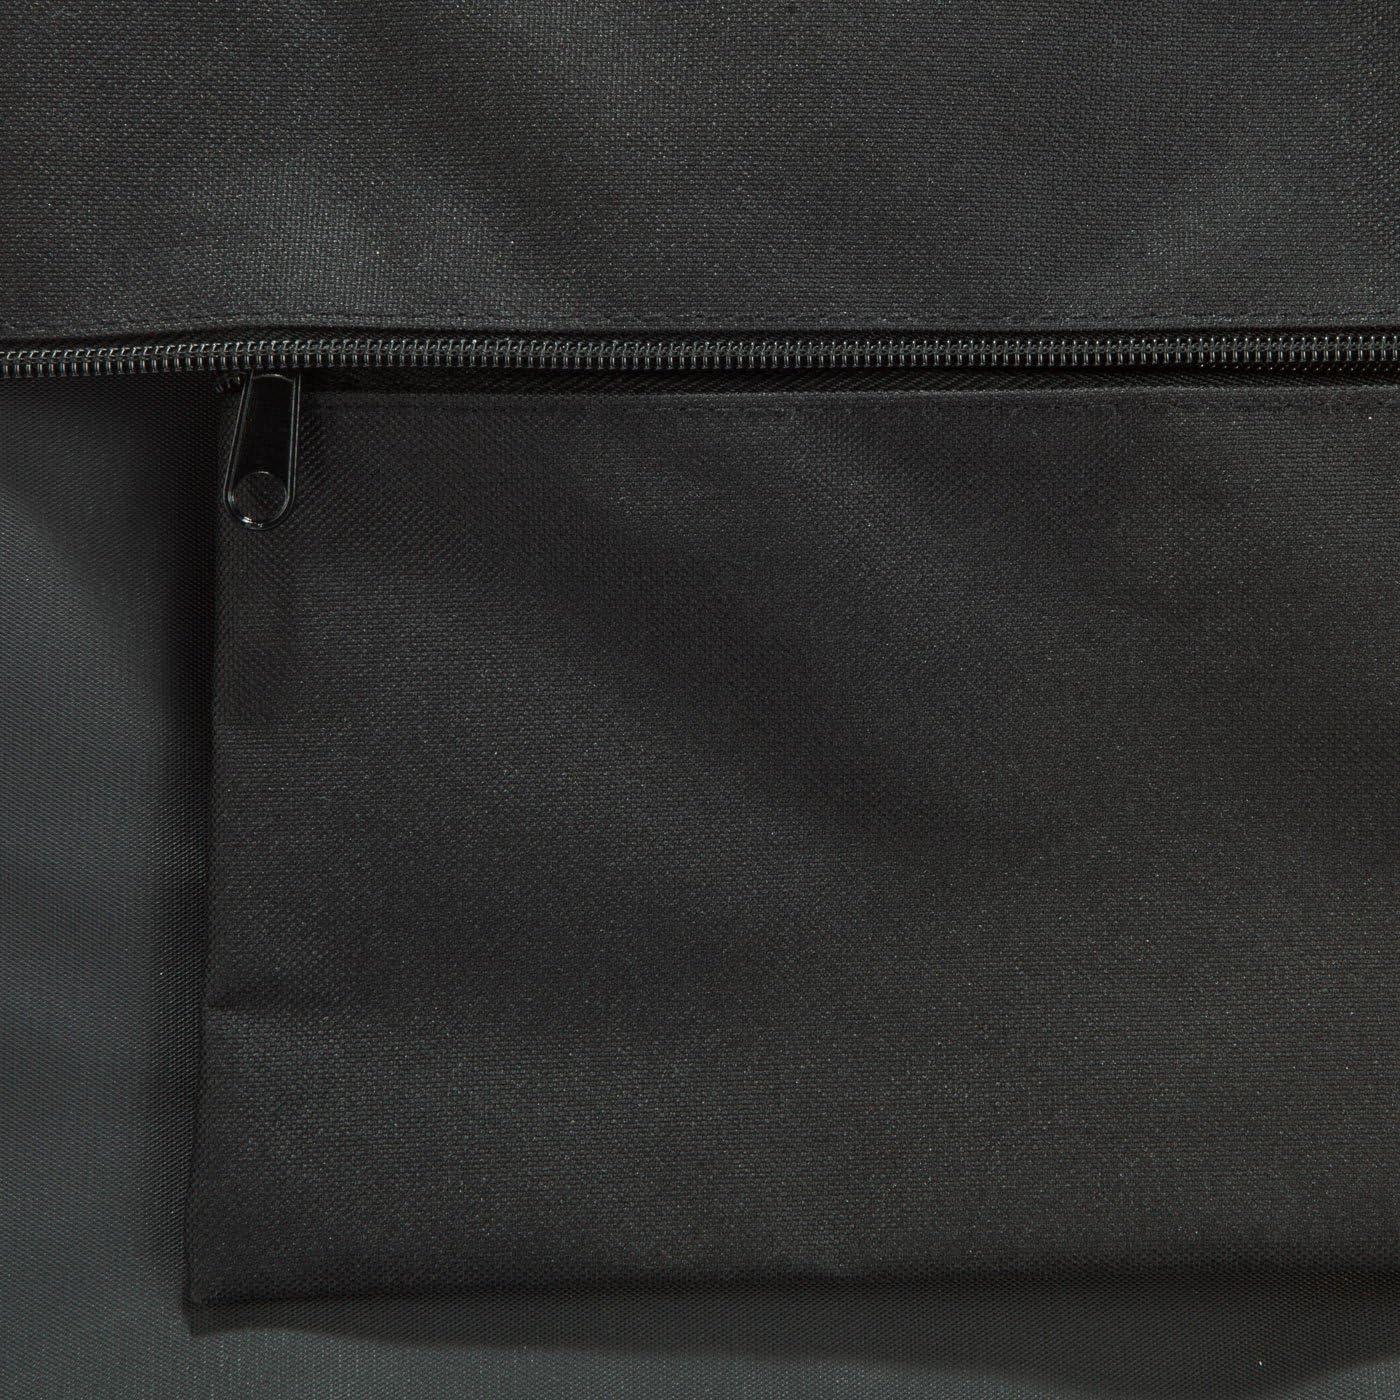 15 l reisenthel shopper M 51 x 30,5 x 26 cm black